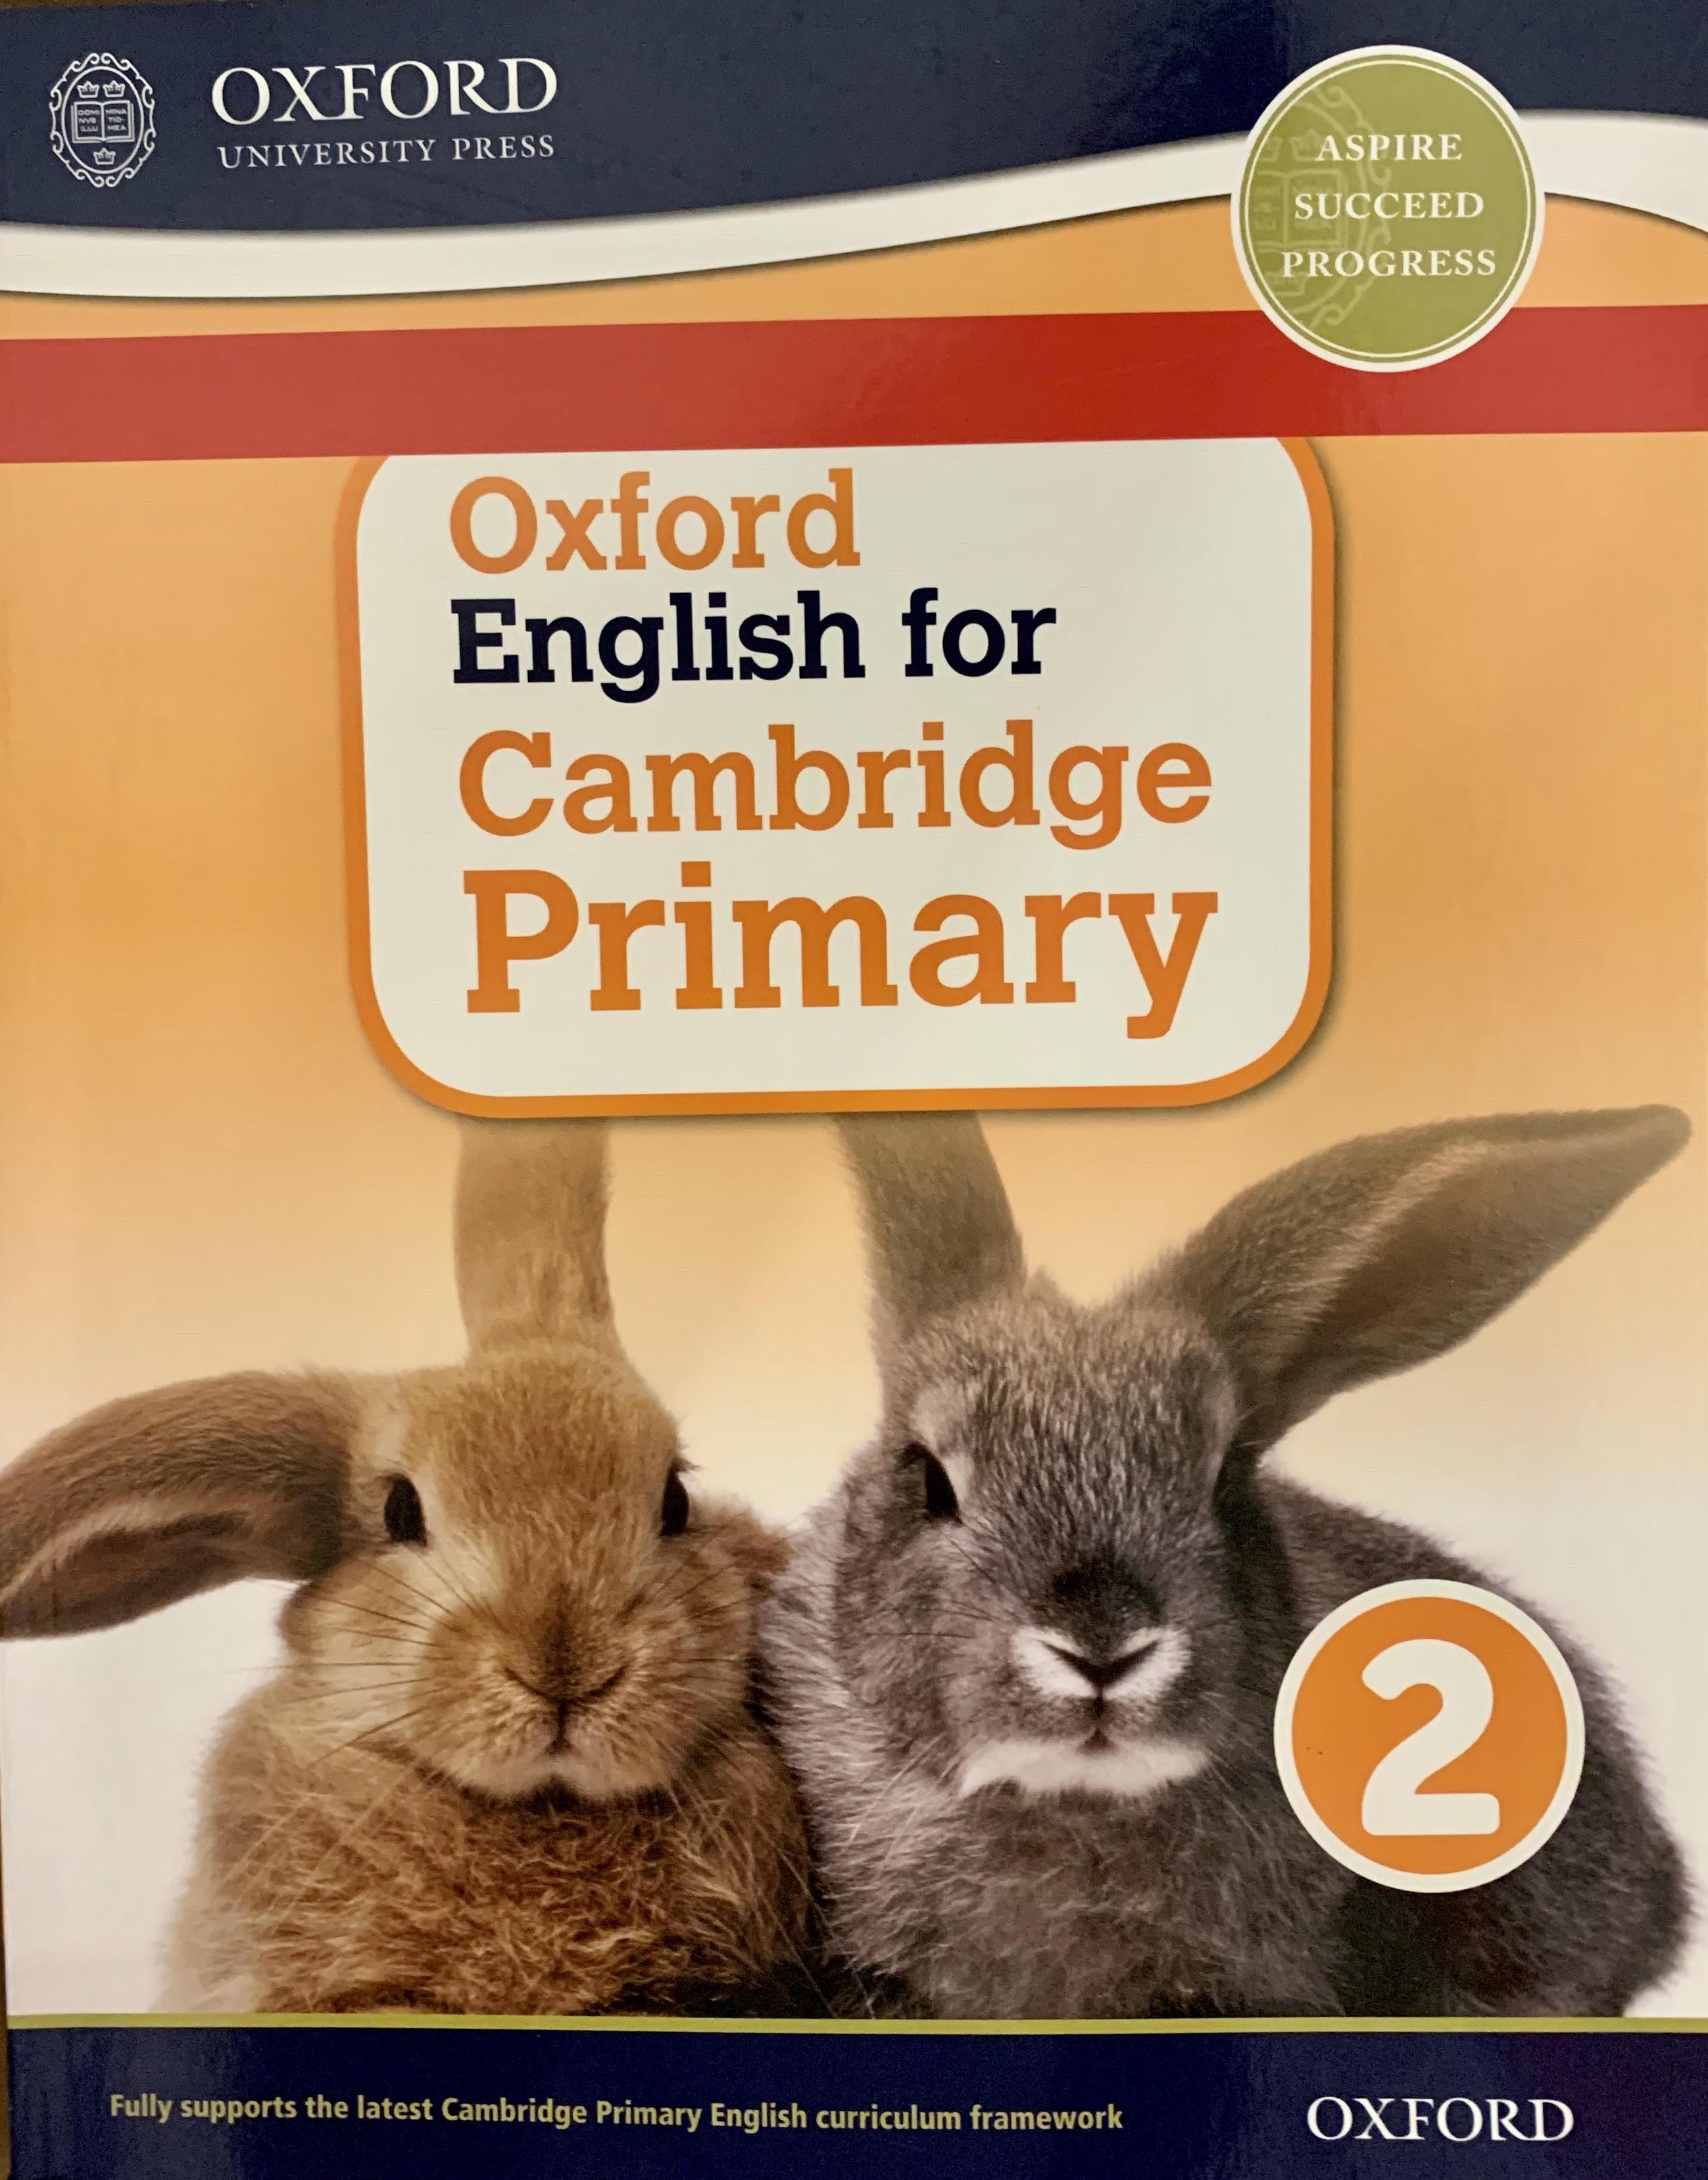 Oxford English for Cambridge Primary 2